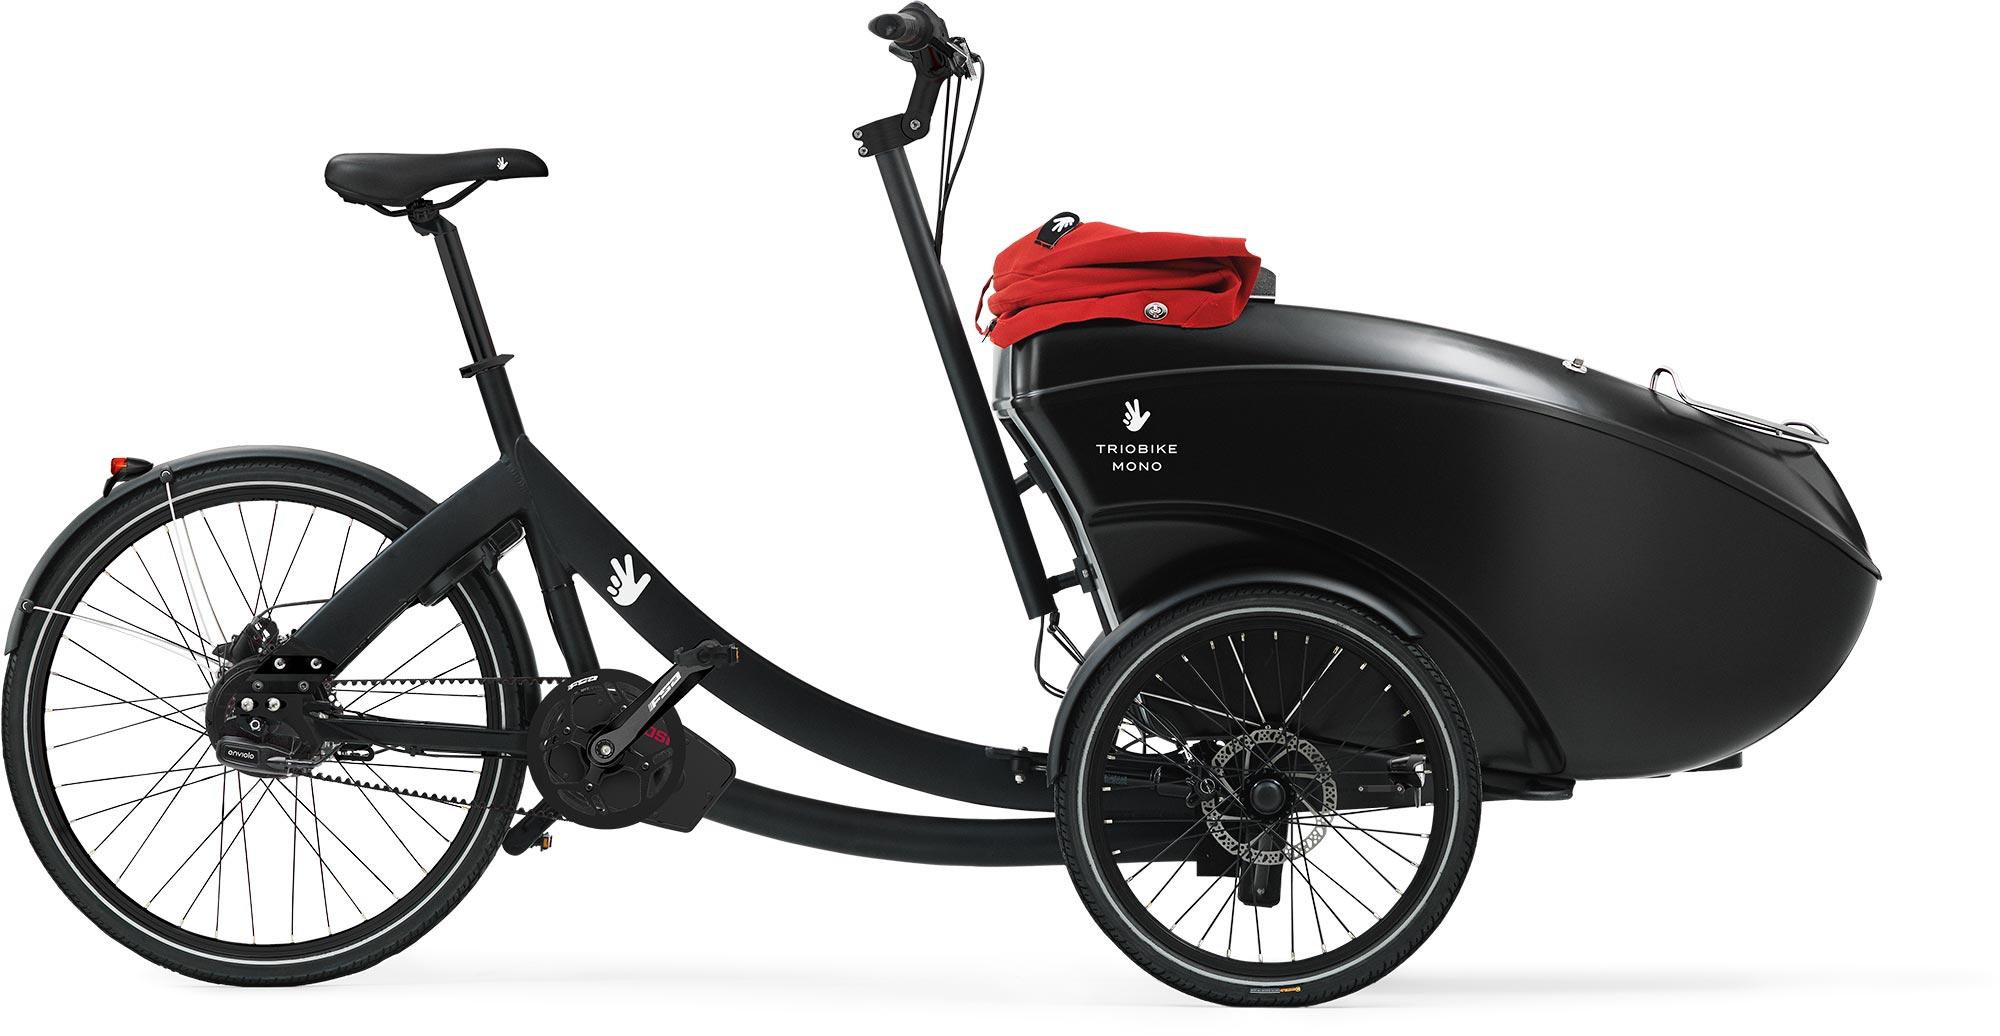 Triobike Mono E Lasten e-Bike / Cargo e-Bike 2018